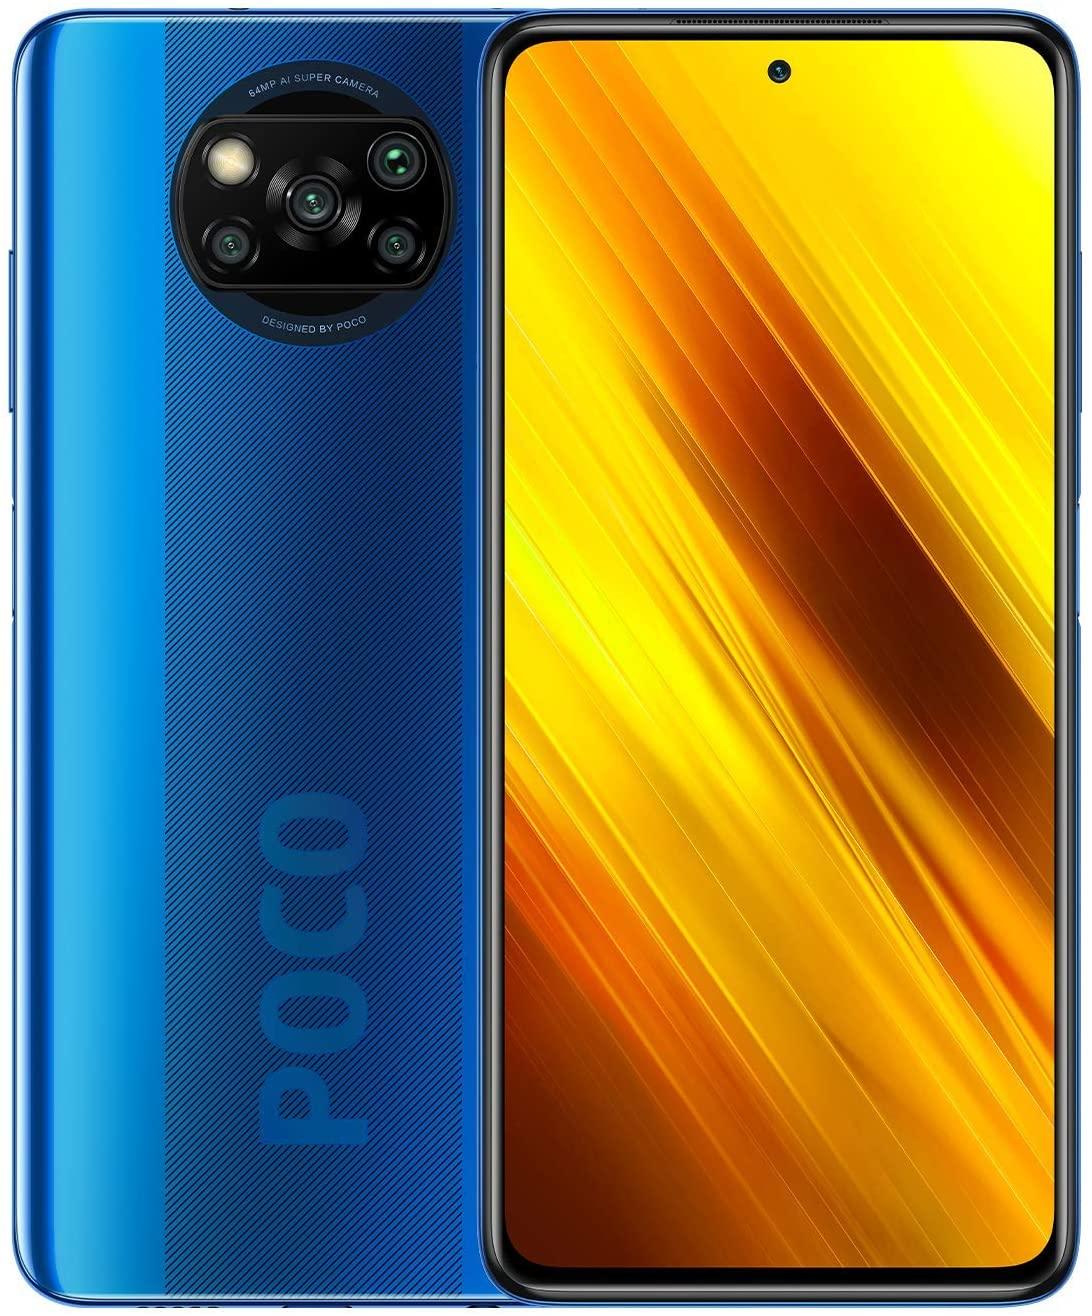 "POCO X3 NFC - Smartphone 6 + 128GB, 6.67"" FHD+ cámara frontal con Punch-hole Display, Snapdragon 732G, 64 MP con IA, Quad-cámara, 5160..."